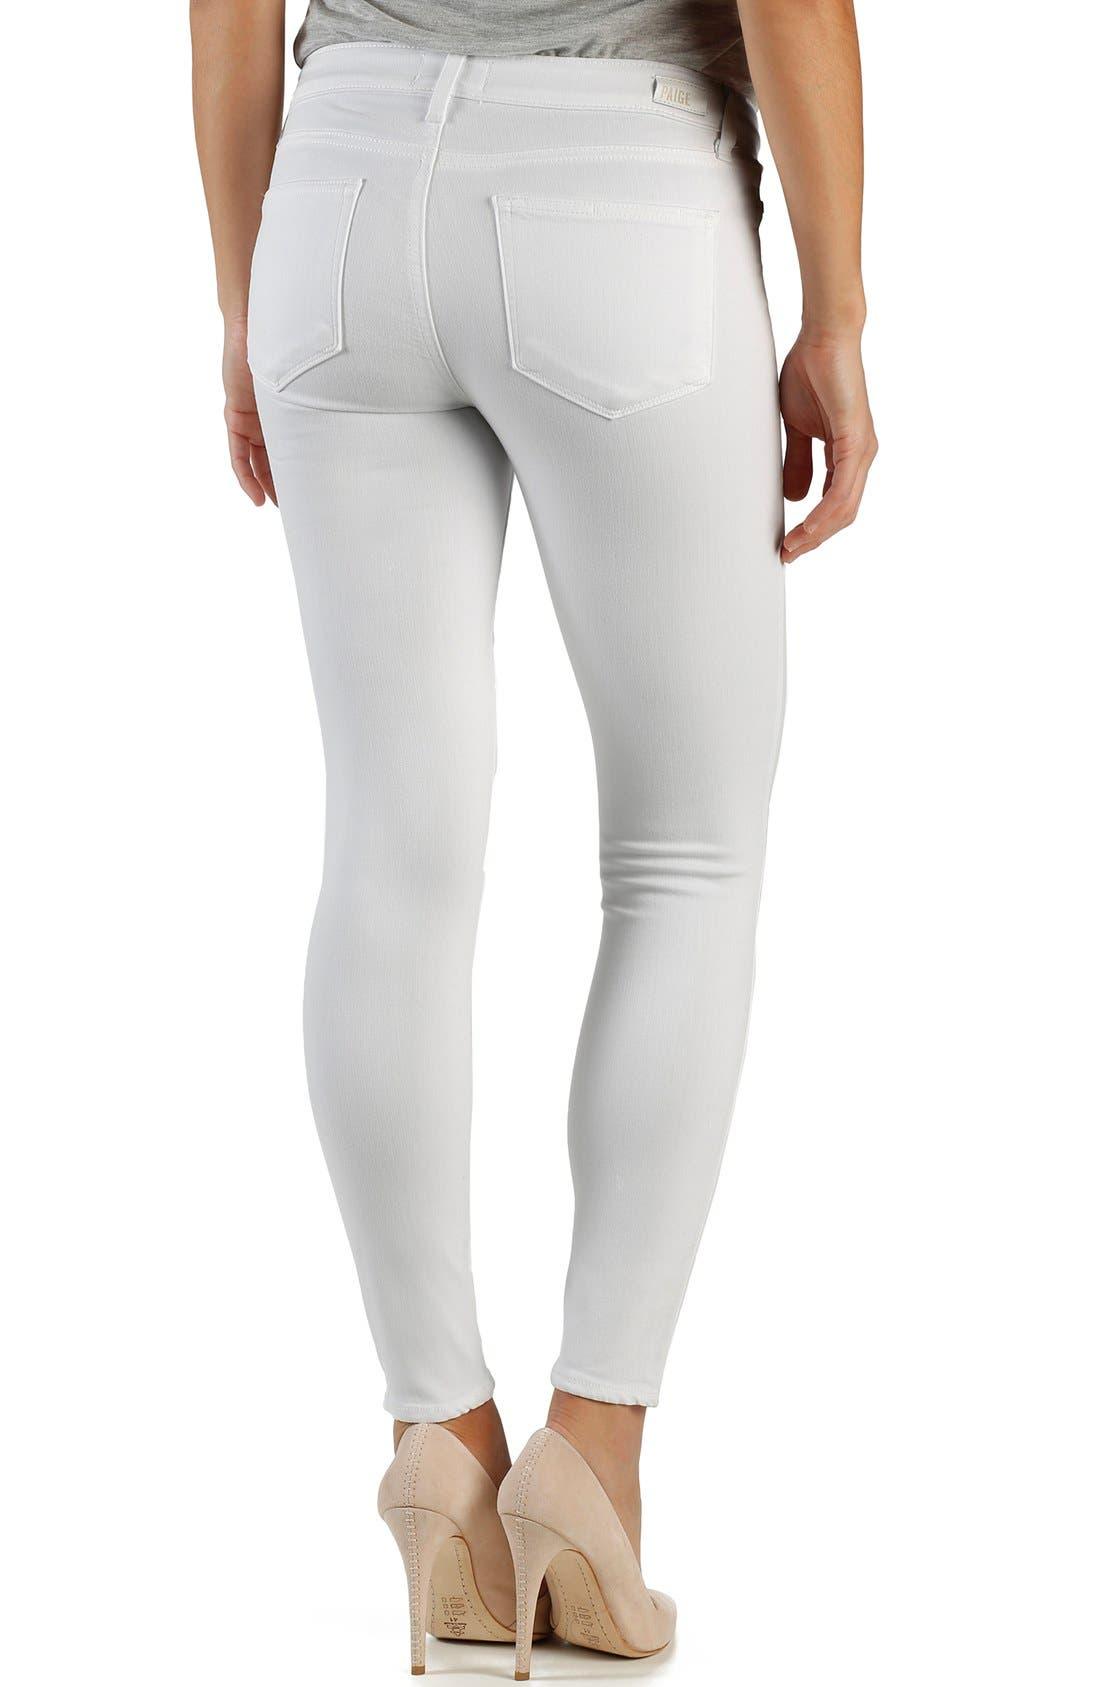 Alternate Image 2  - Paige Denim 'Transcend - Verdugo' Ankle Skinny Jeans (White Mist)